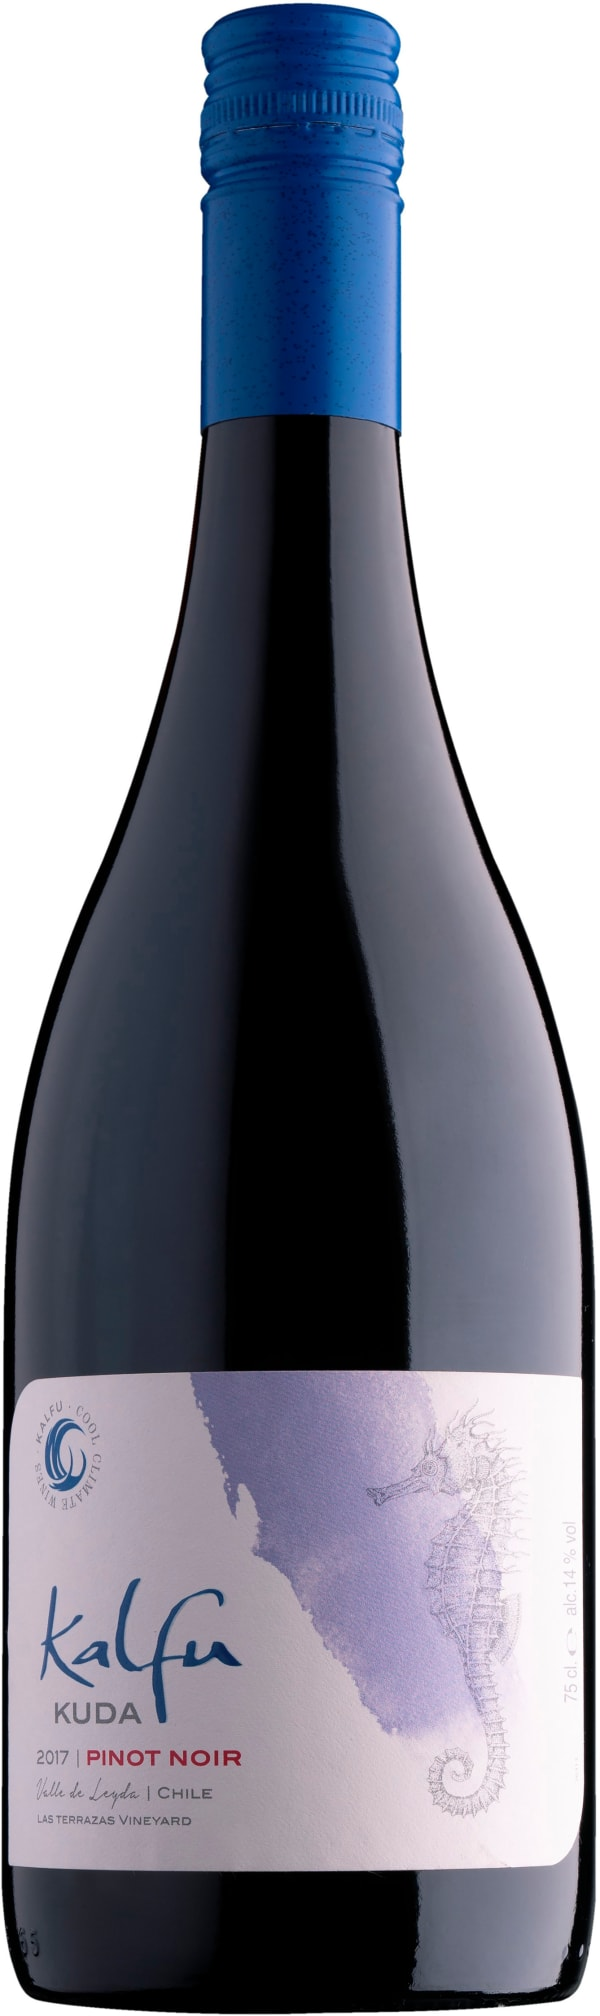 Kalfu Kuda Pinot Noir 2018